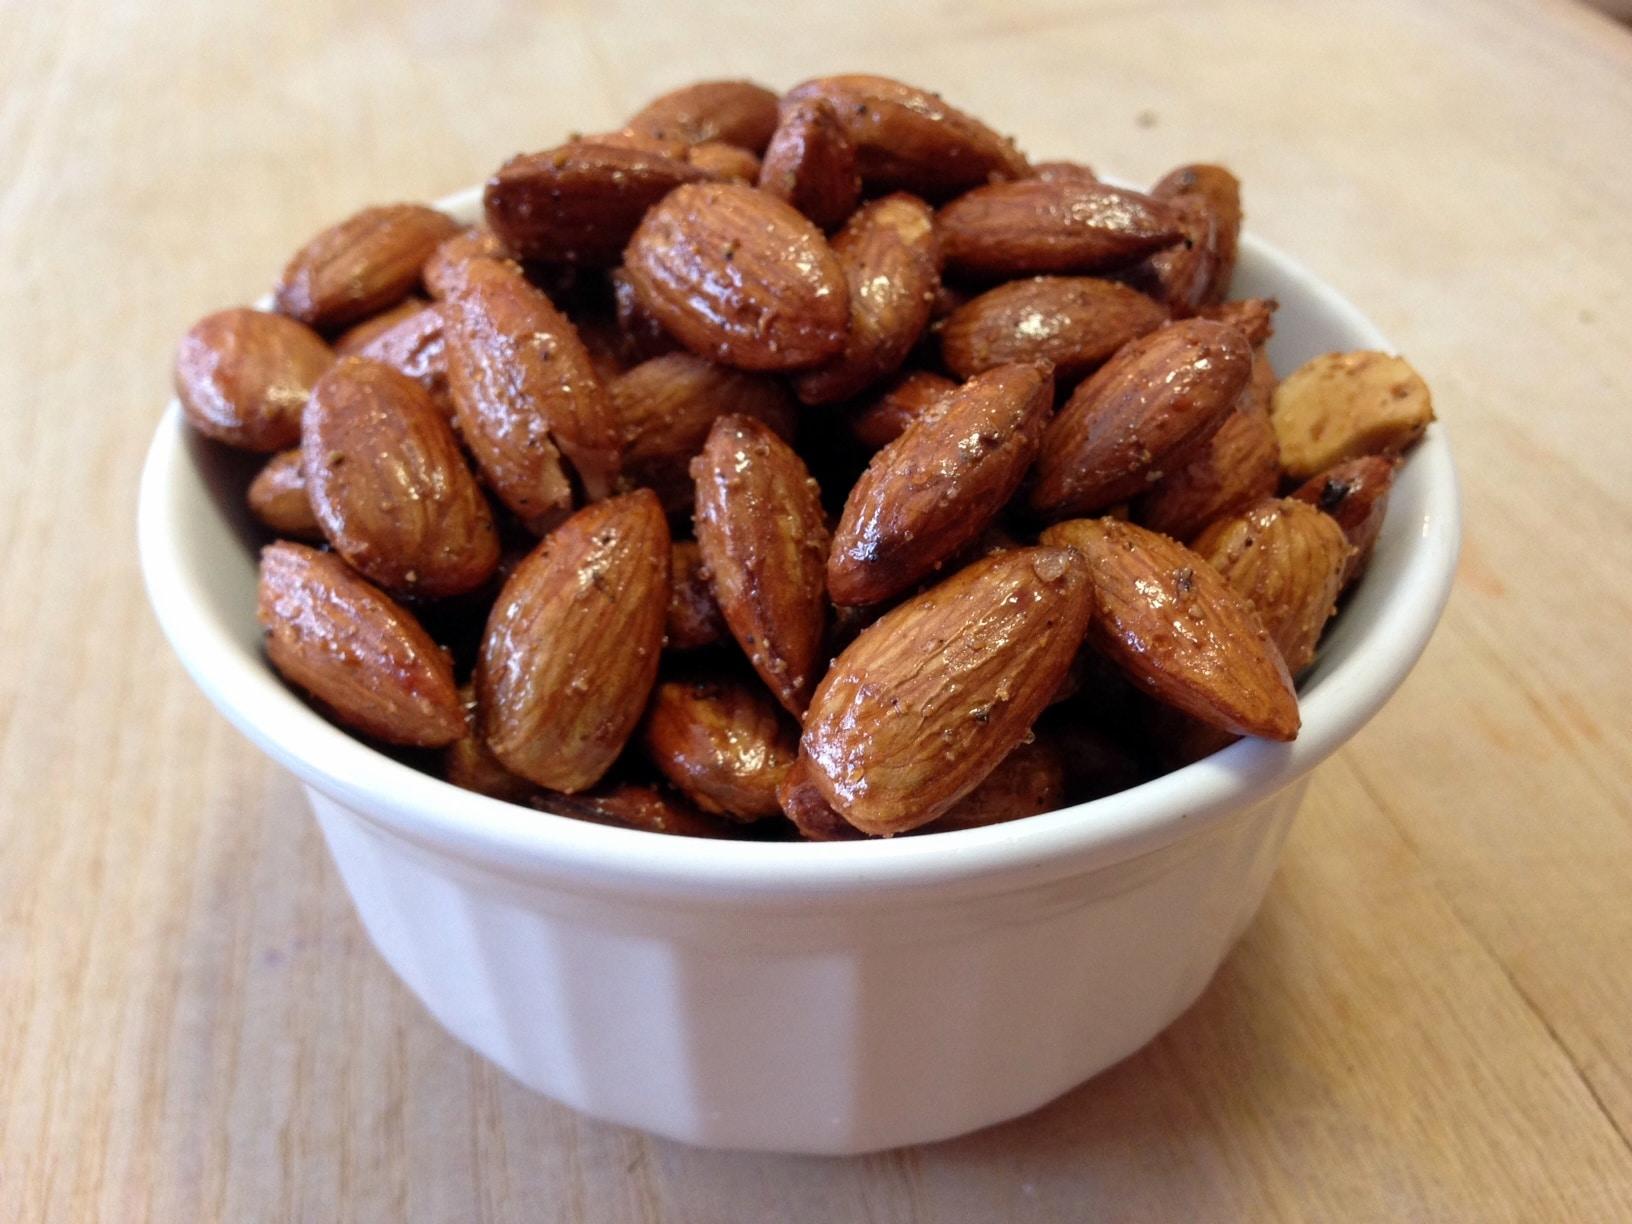 Roasted and seasoned S'nuts